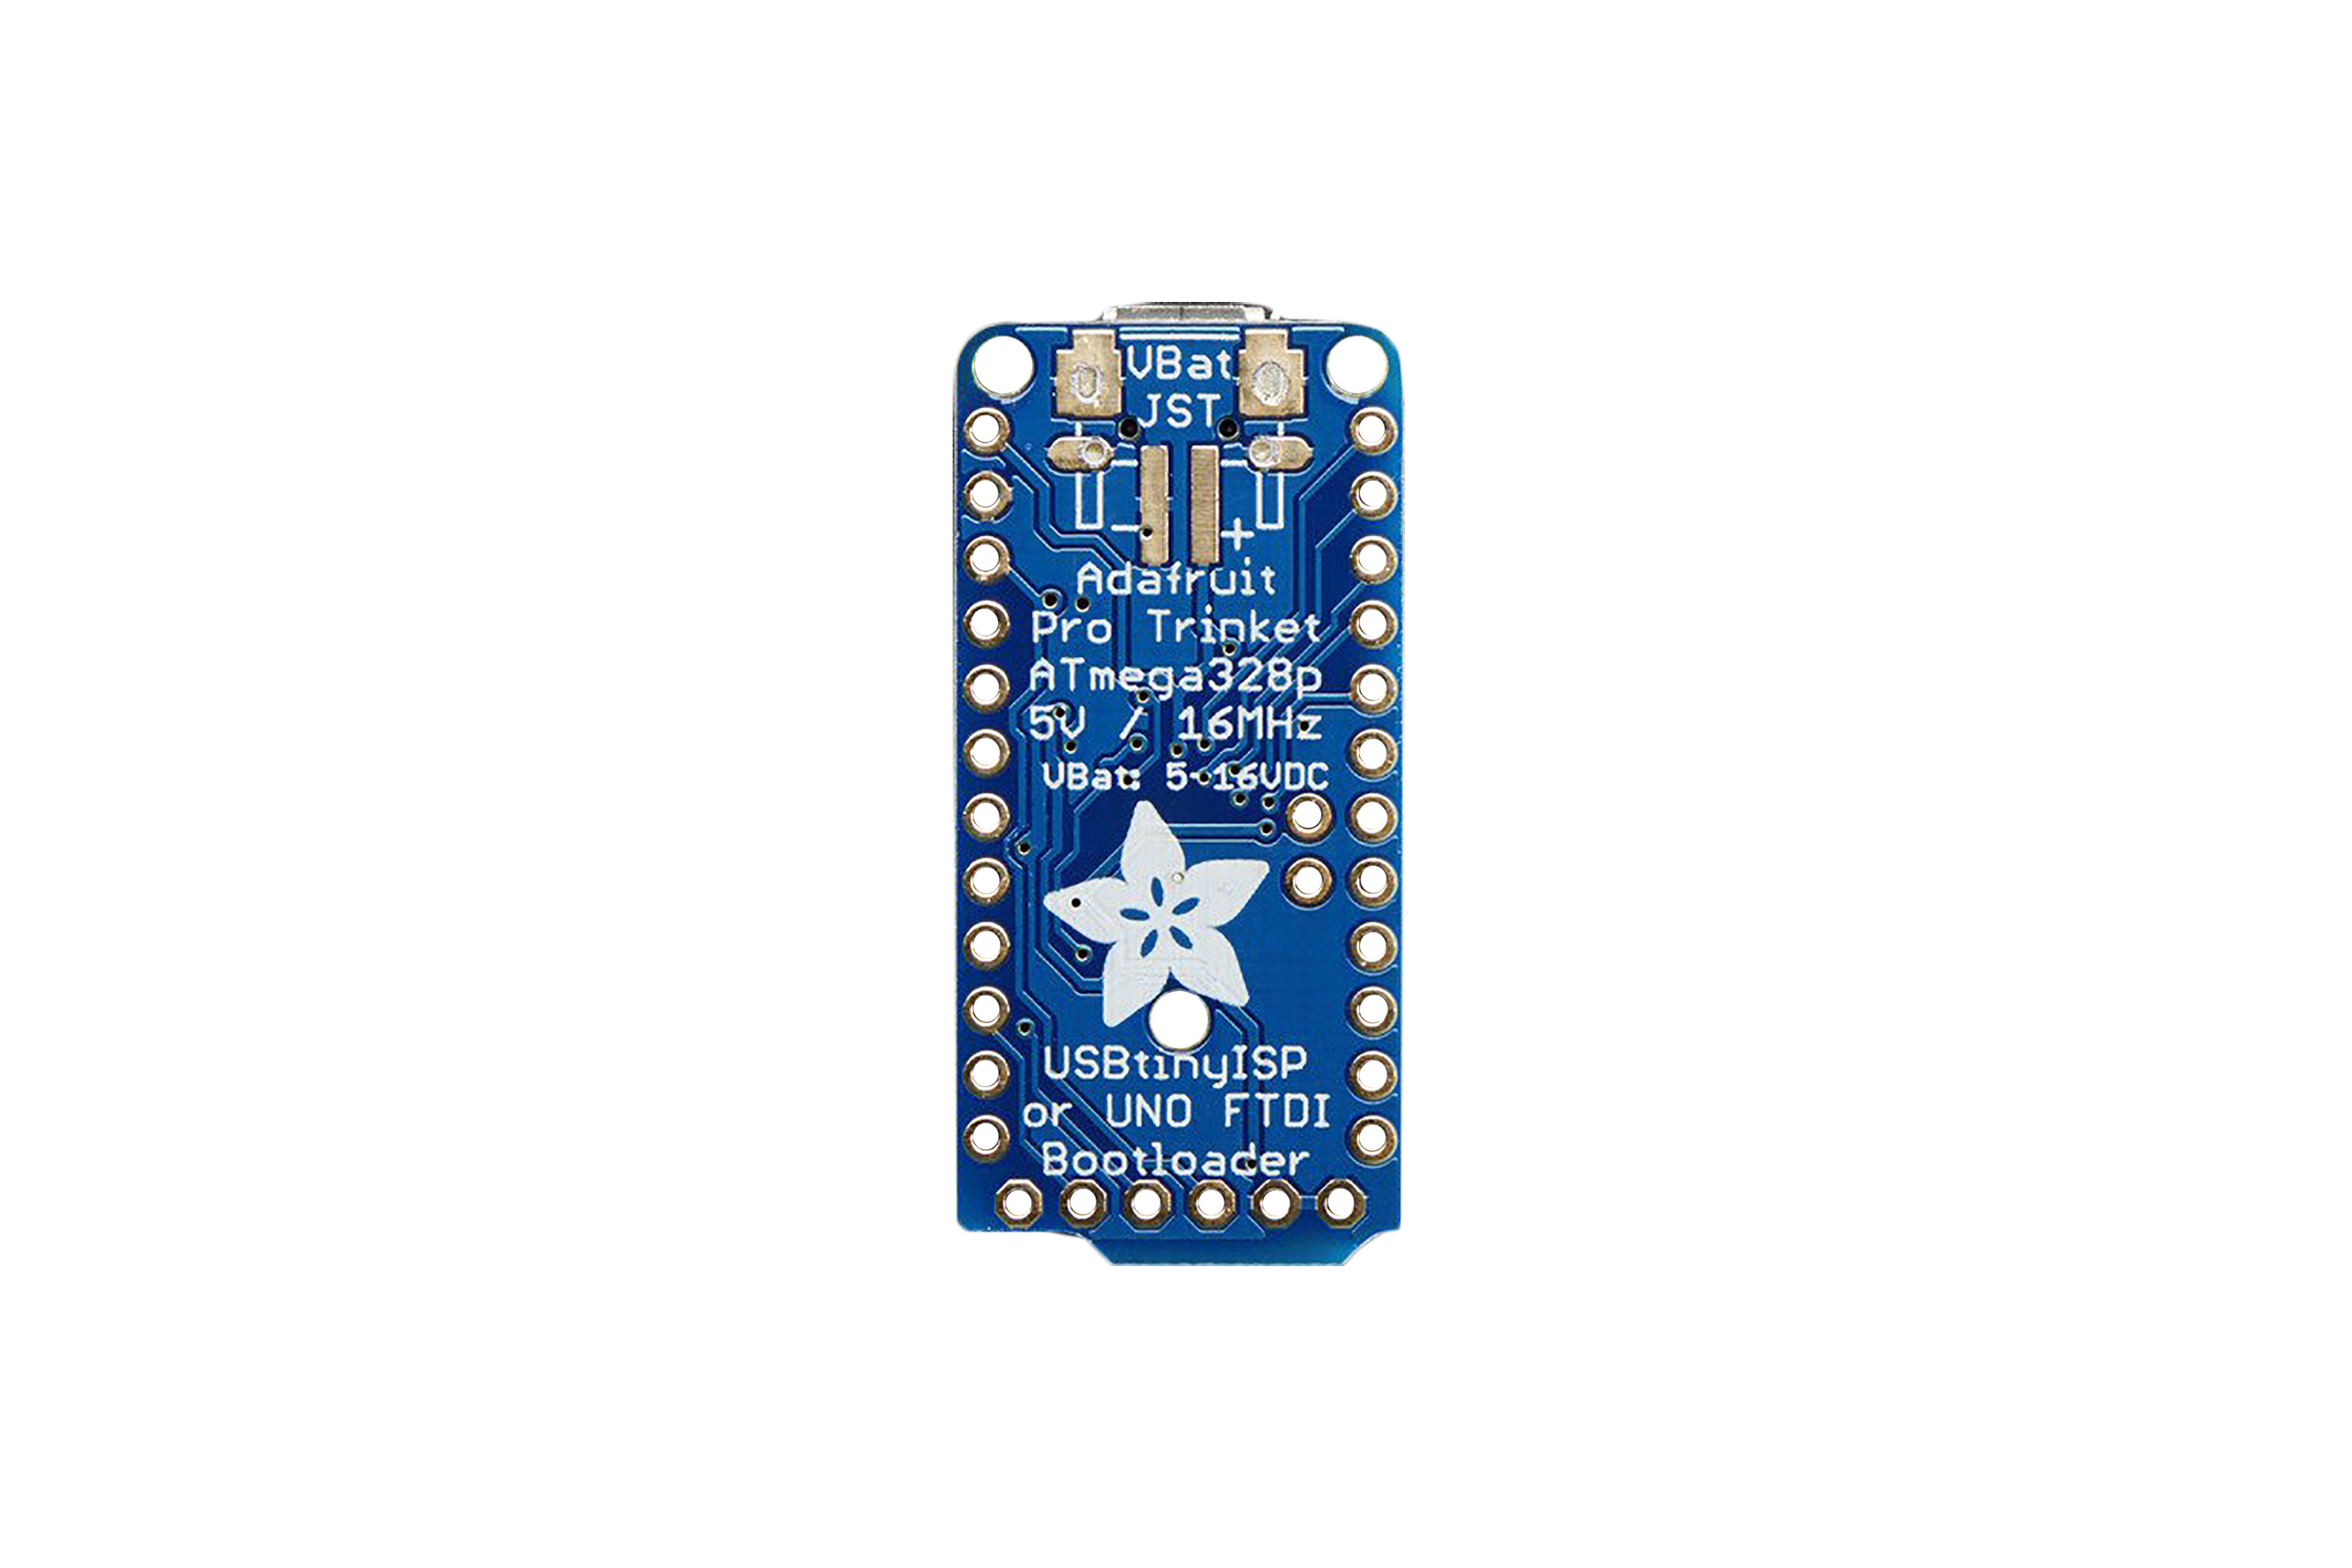 Adafruit(アダフルーツ)Pro Trinket - 5V 16MHz